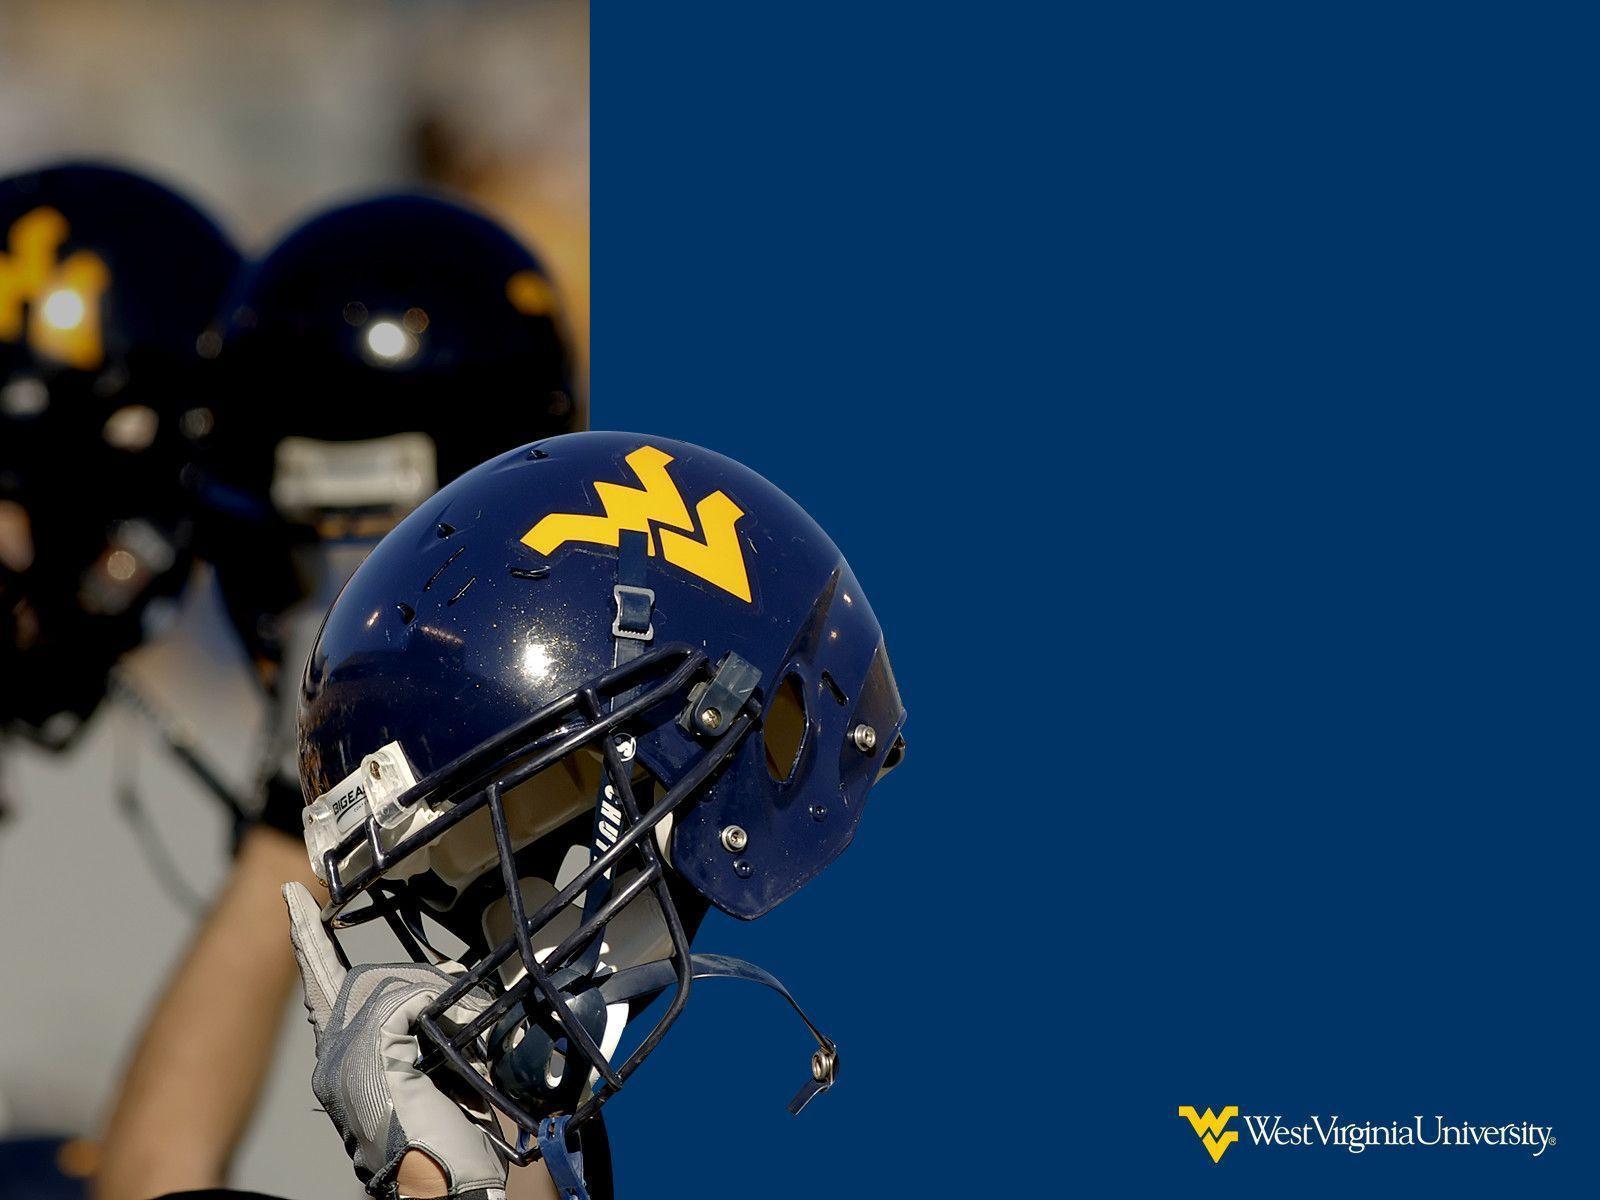 Download West Virginia Football Wallpaper Gallery